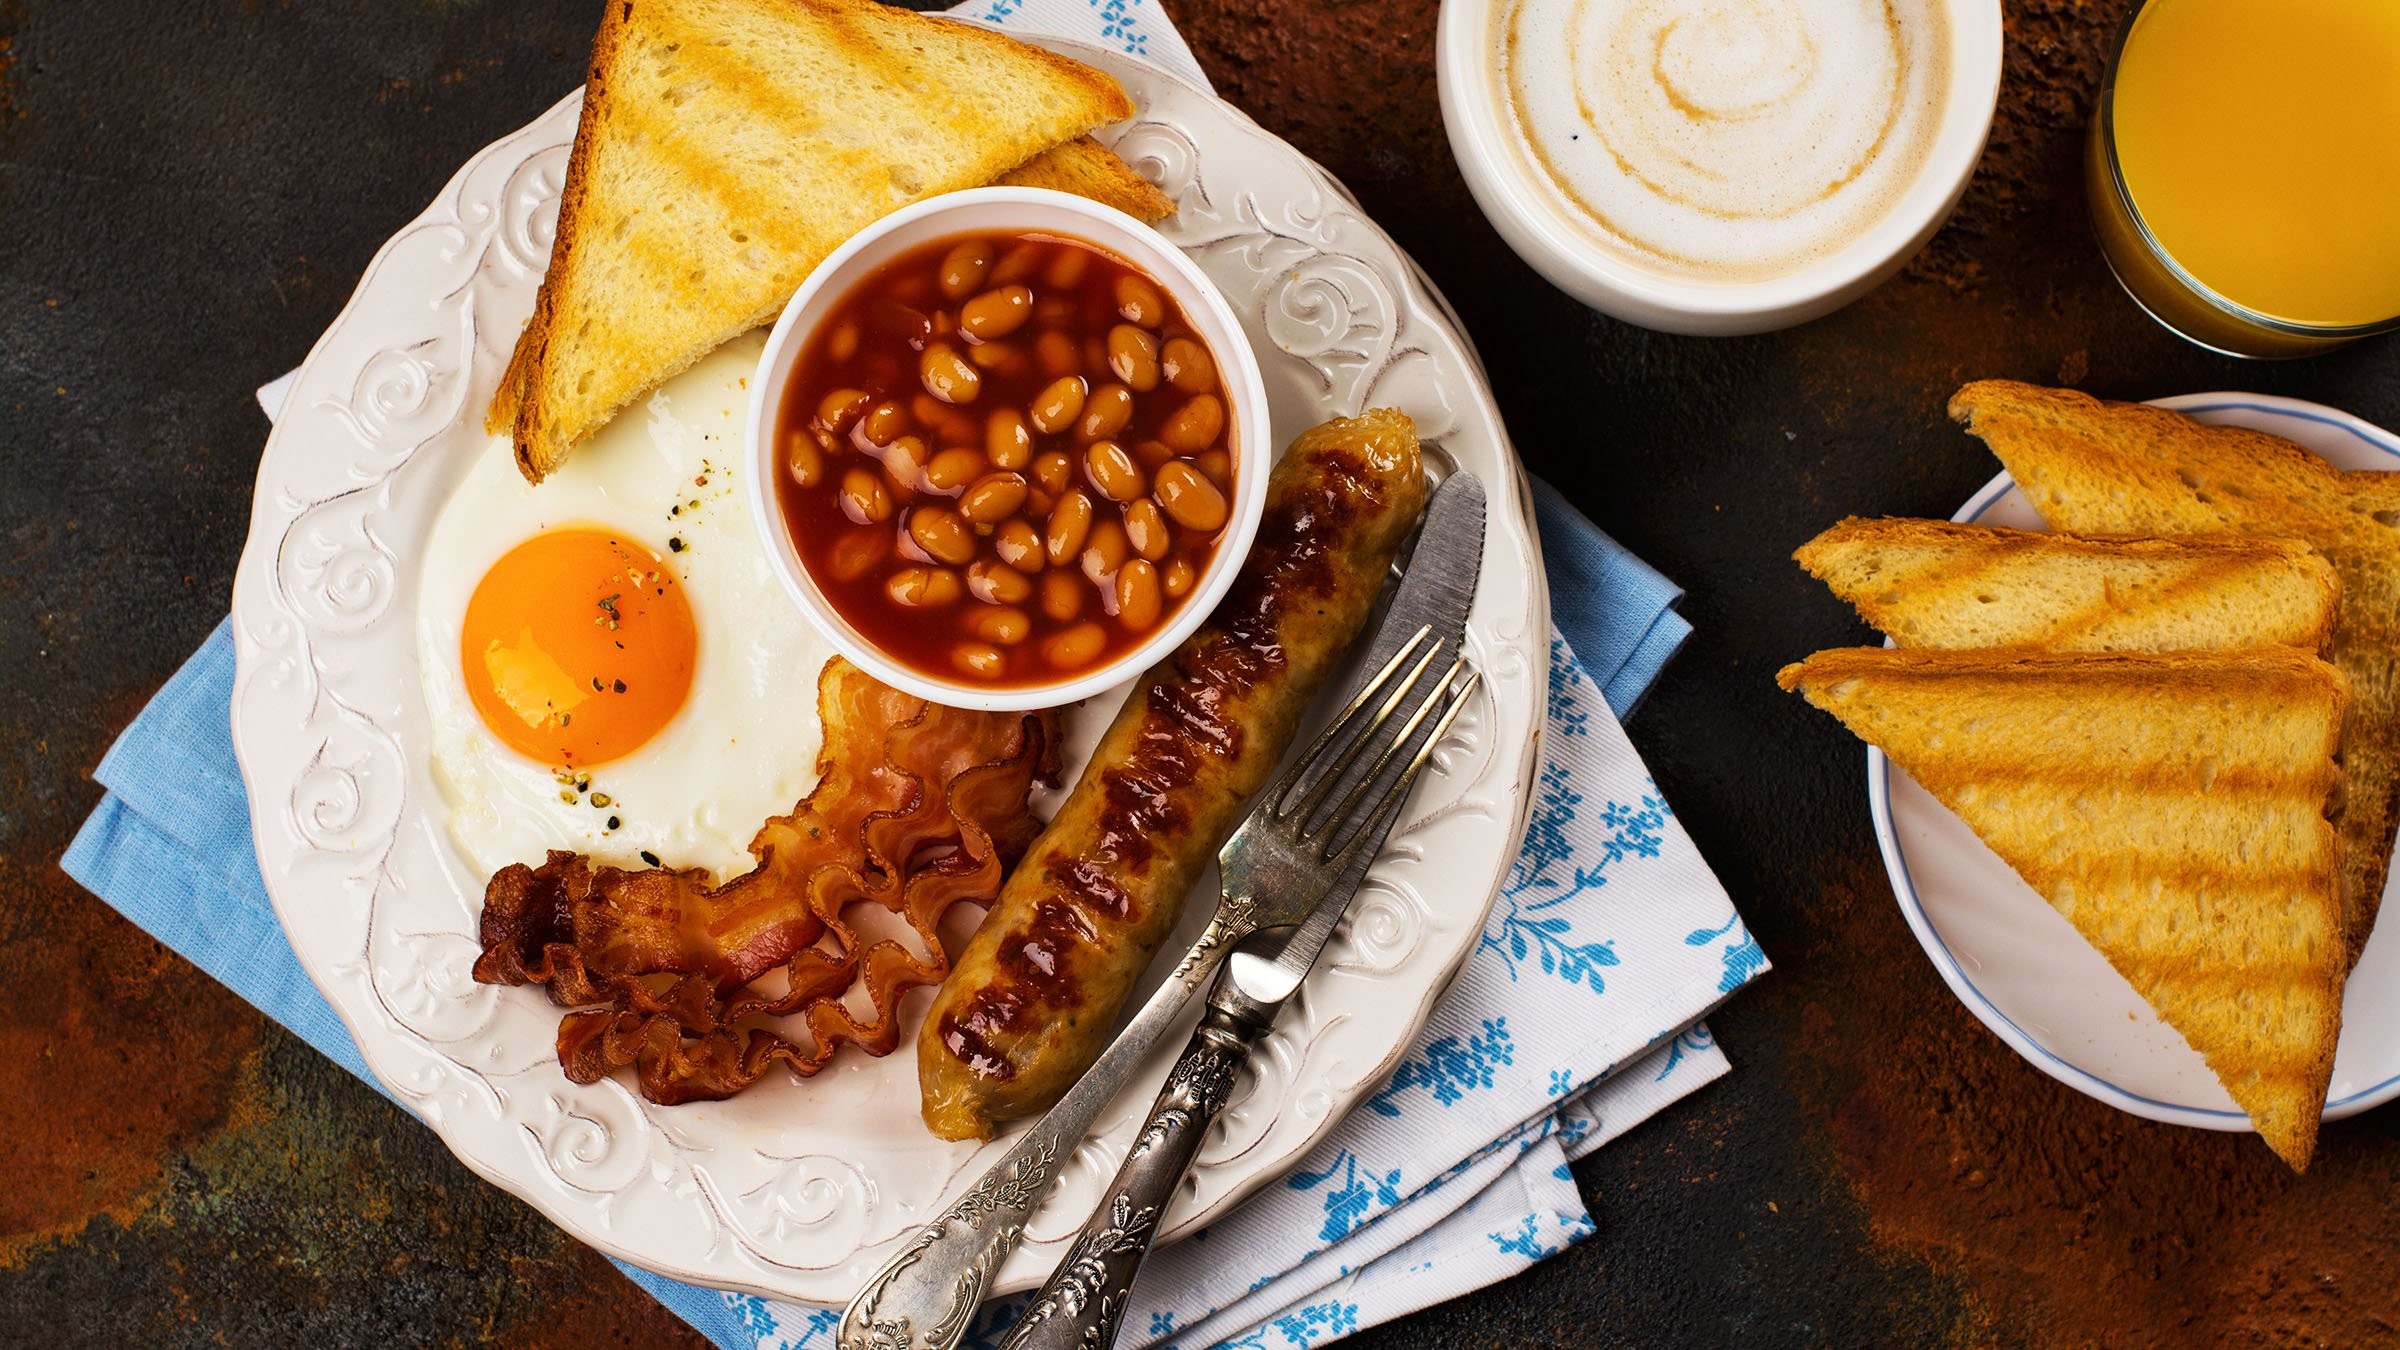 comida t pica de inglaterra desayuno ingl s